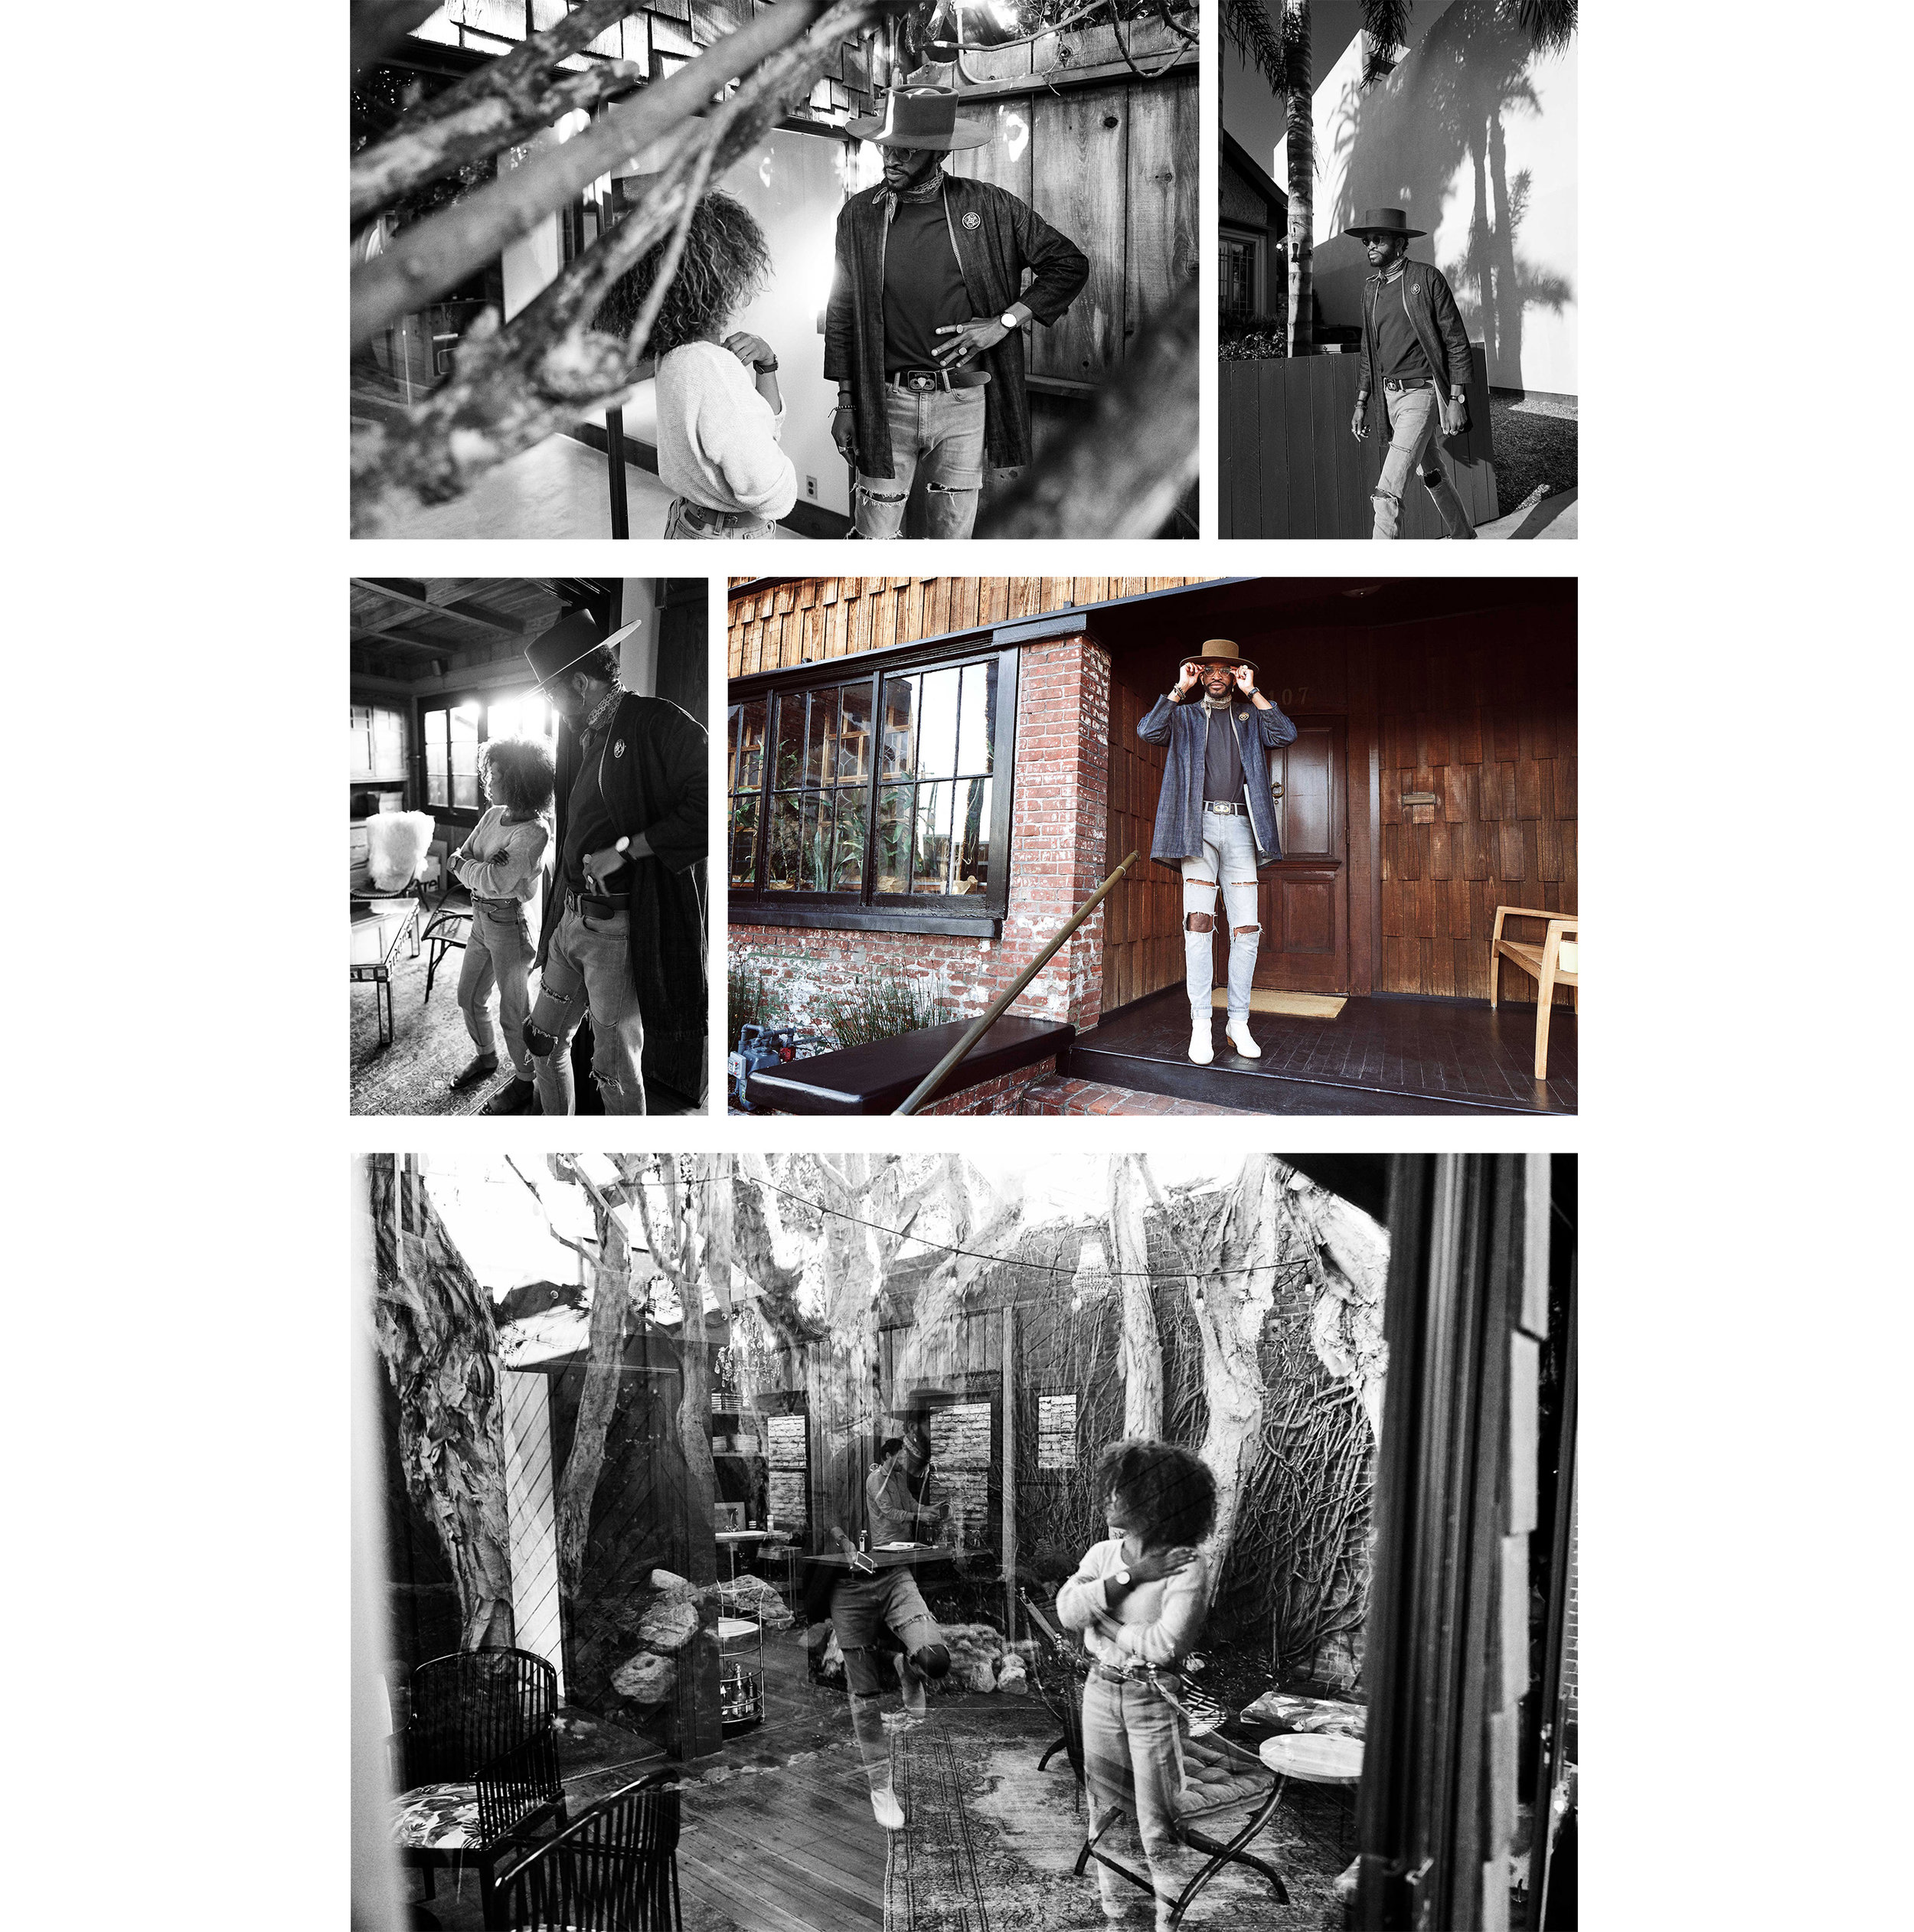 michael-scott-slosar-emmett-skyy-la-street-stories-7.jpg